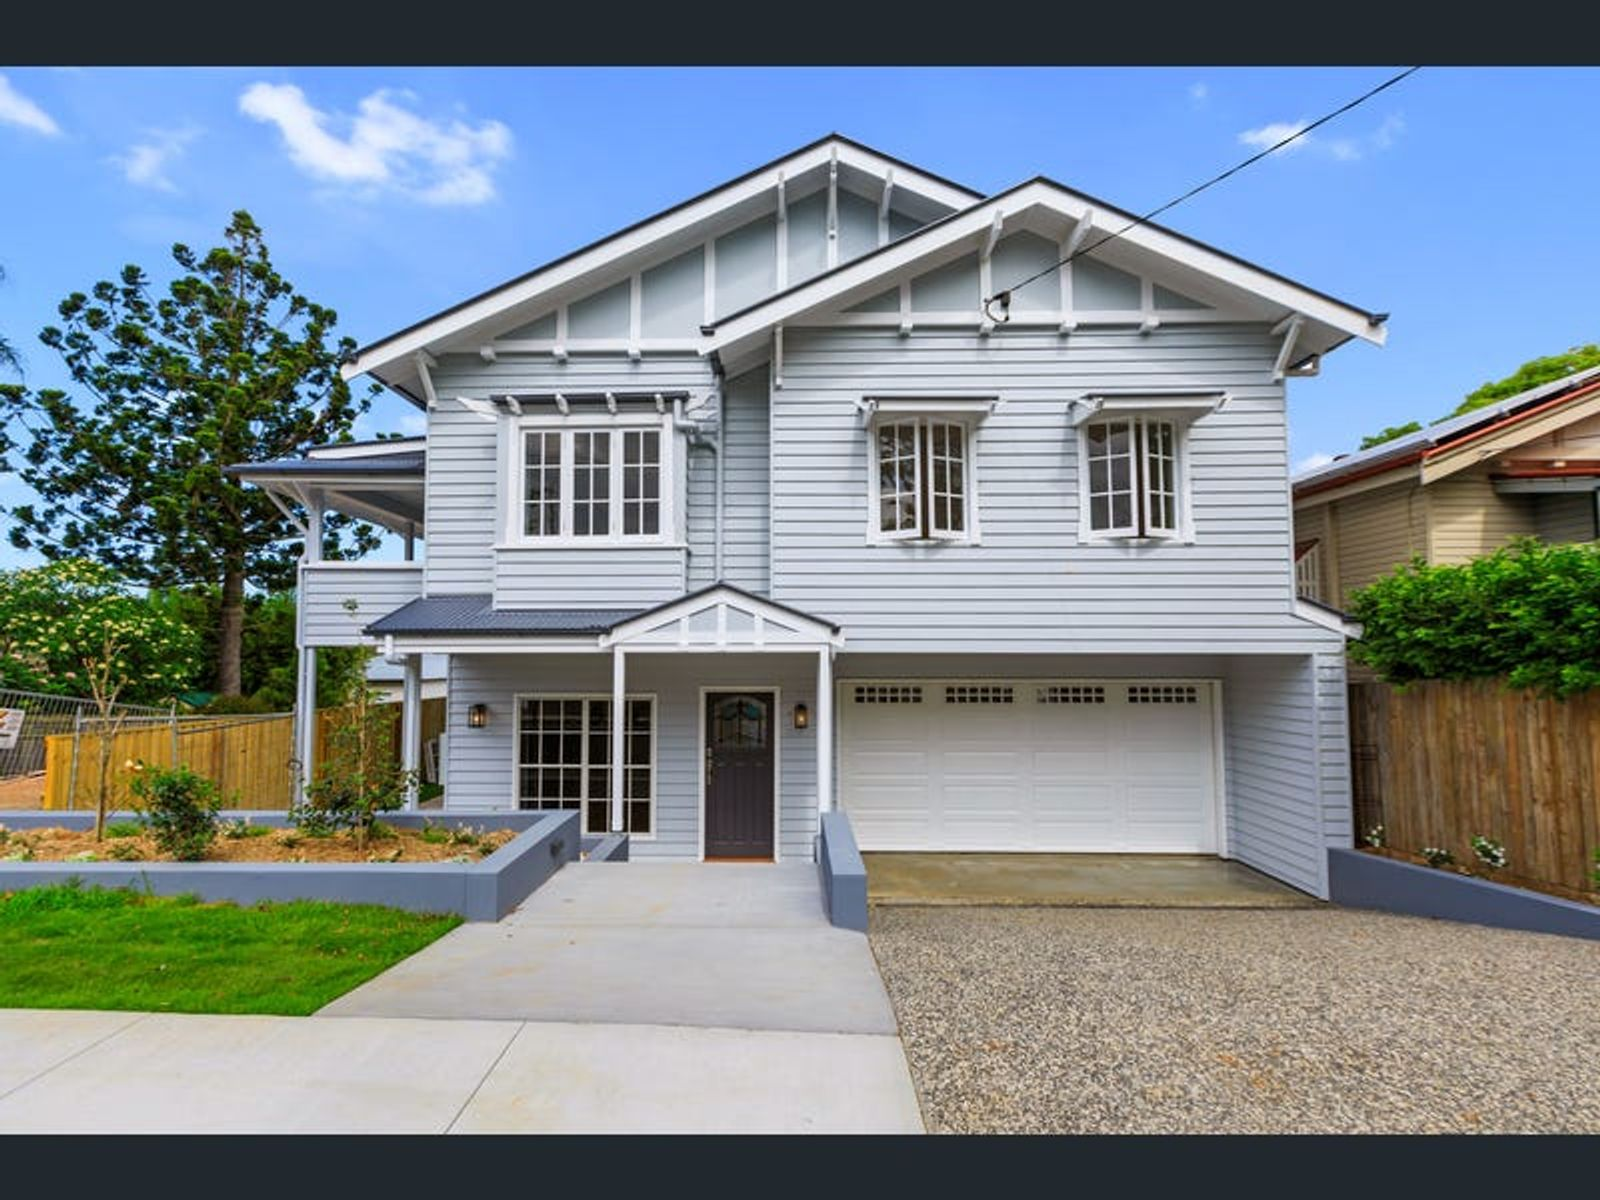 Lot 41 Dempsey Street, Annerley, QLD 4103